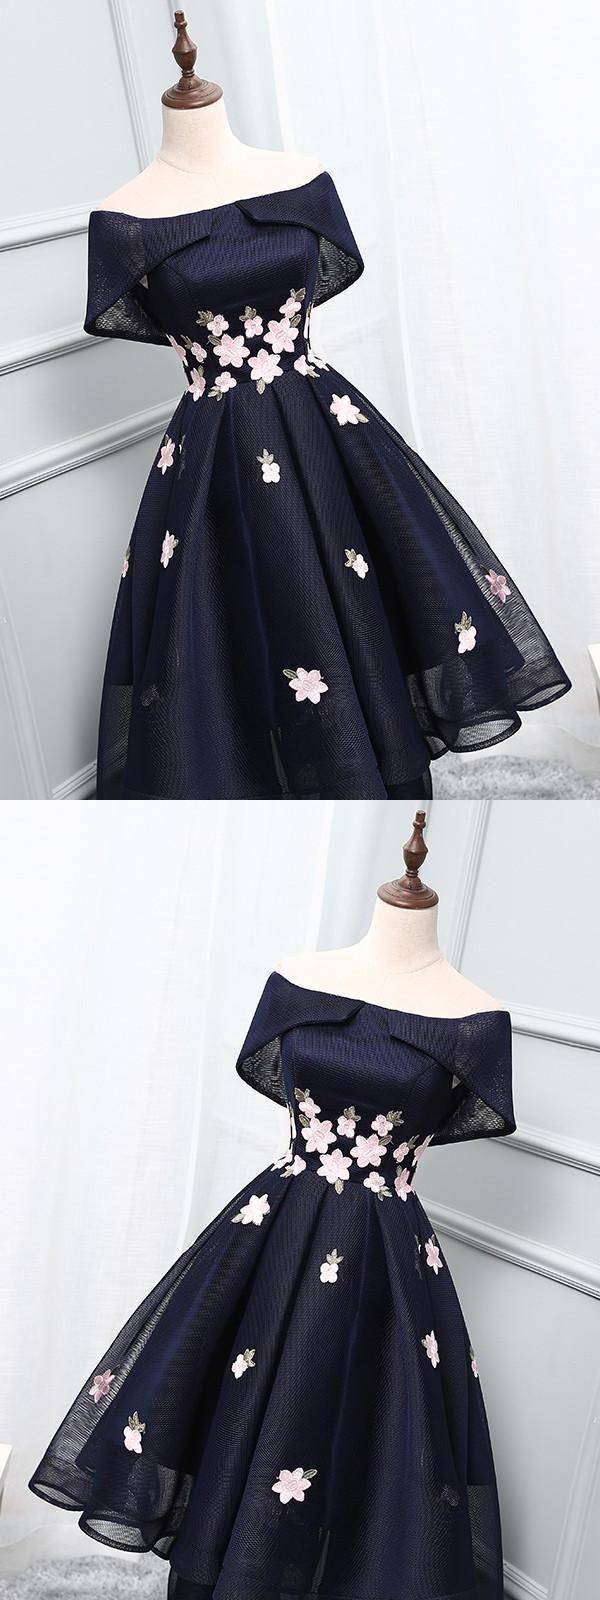 Homecoming dresses prom dresses black prom dresses aline